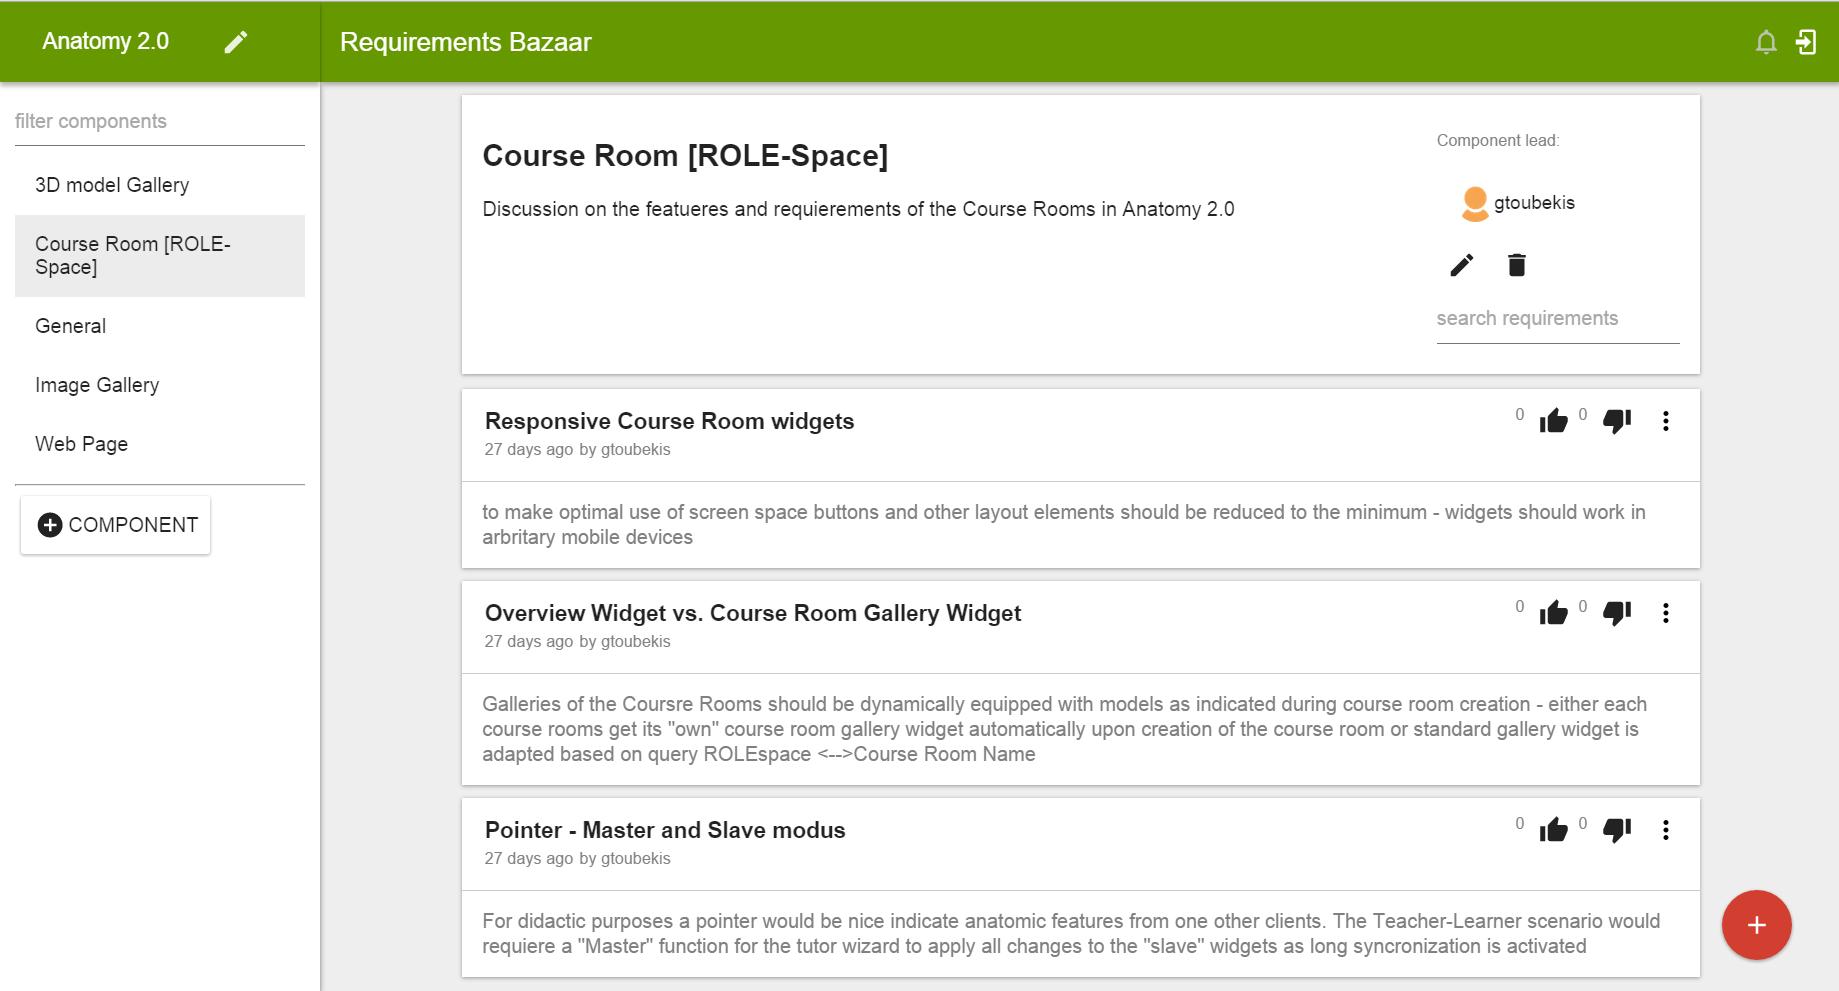 las2peer – Open Source P2P-based Community Service Platform